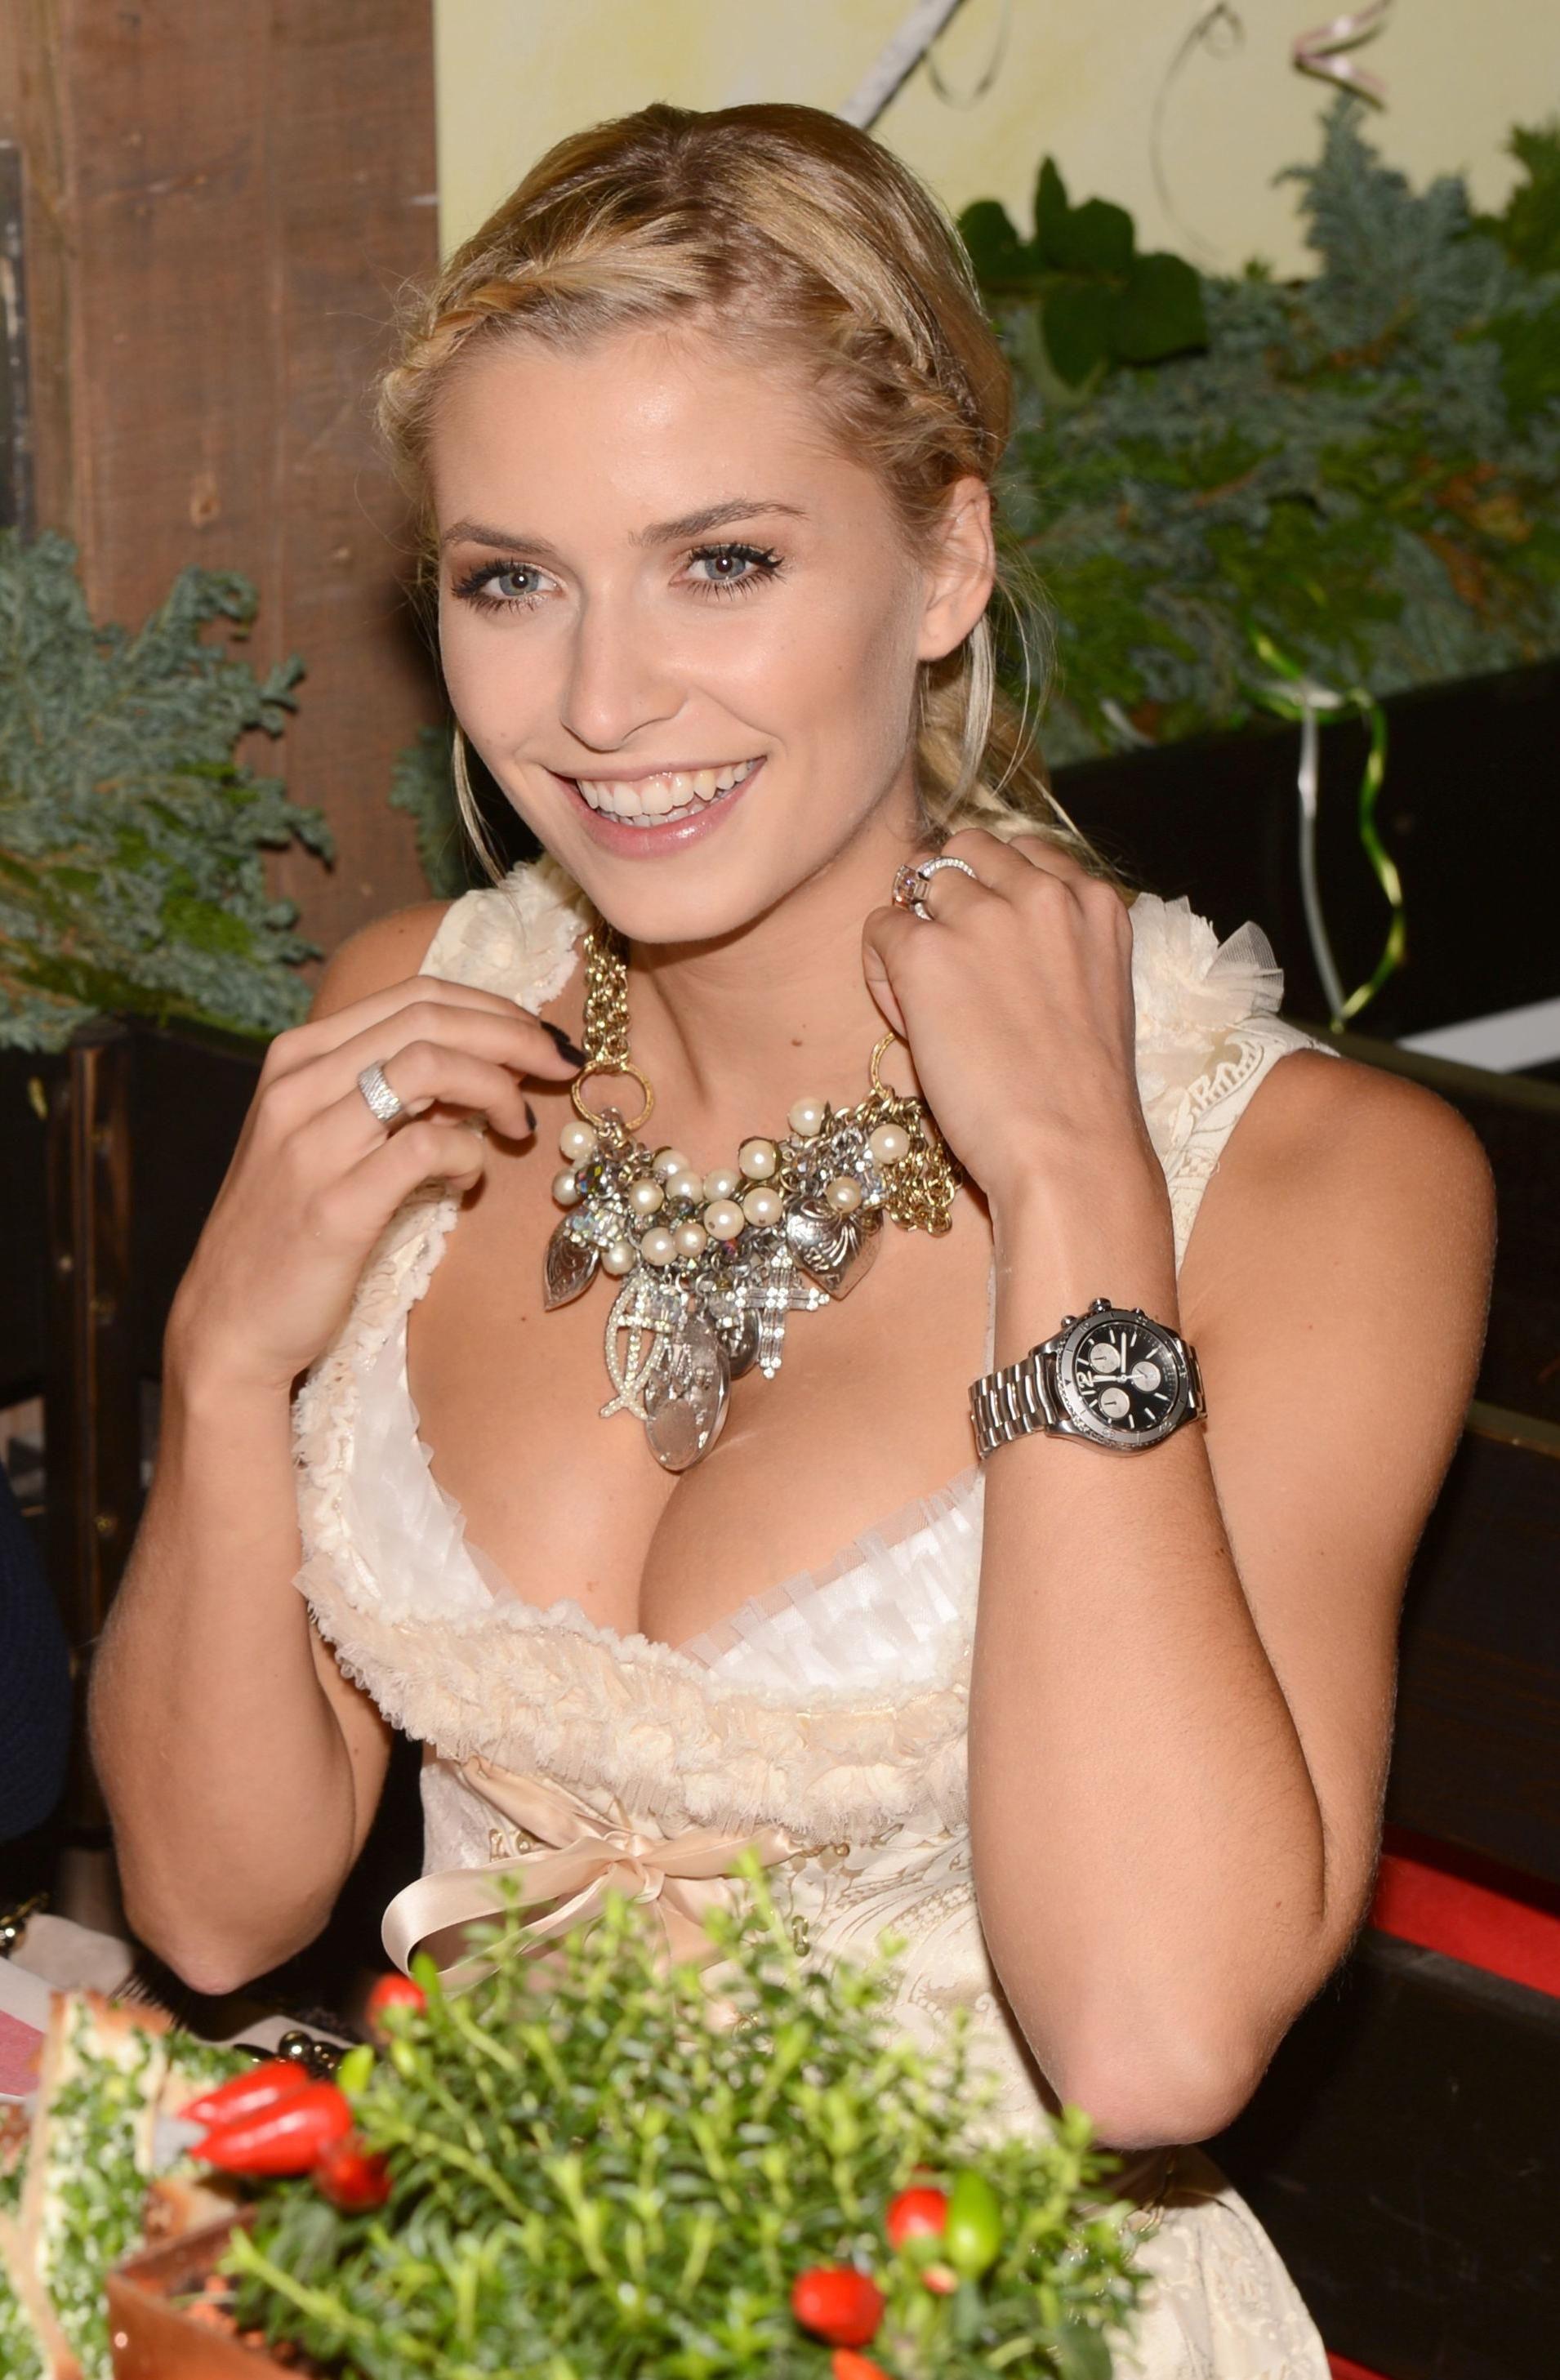 Pin By Sarah Dean On Classy Beauties Lena Gercke